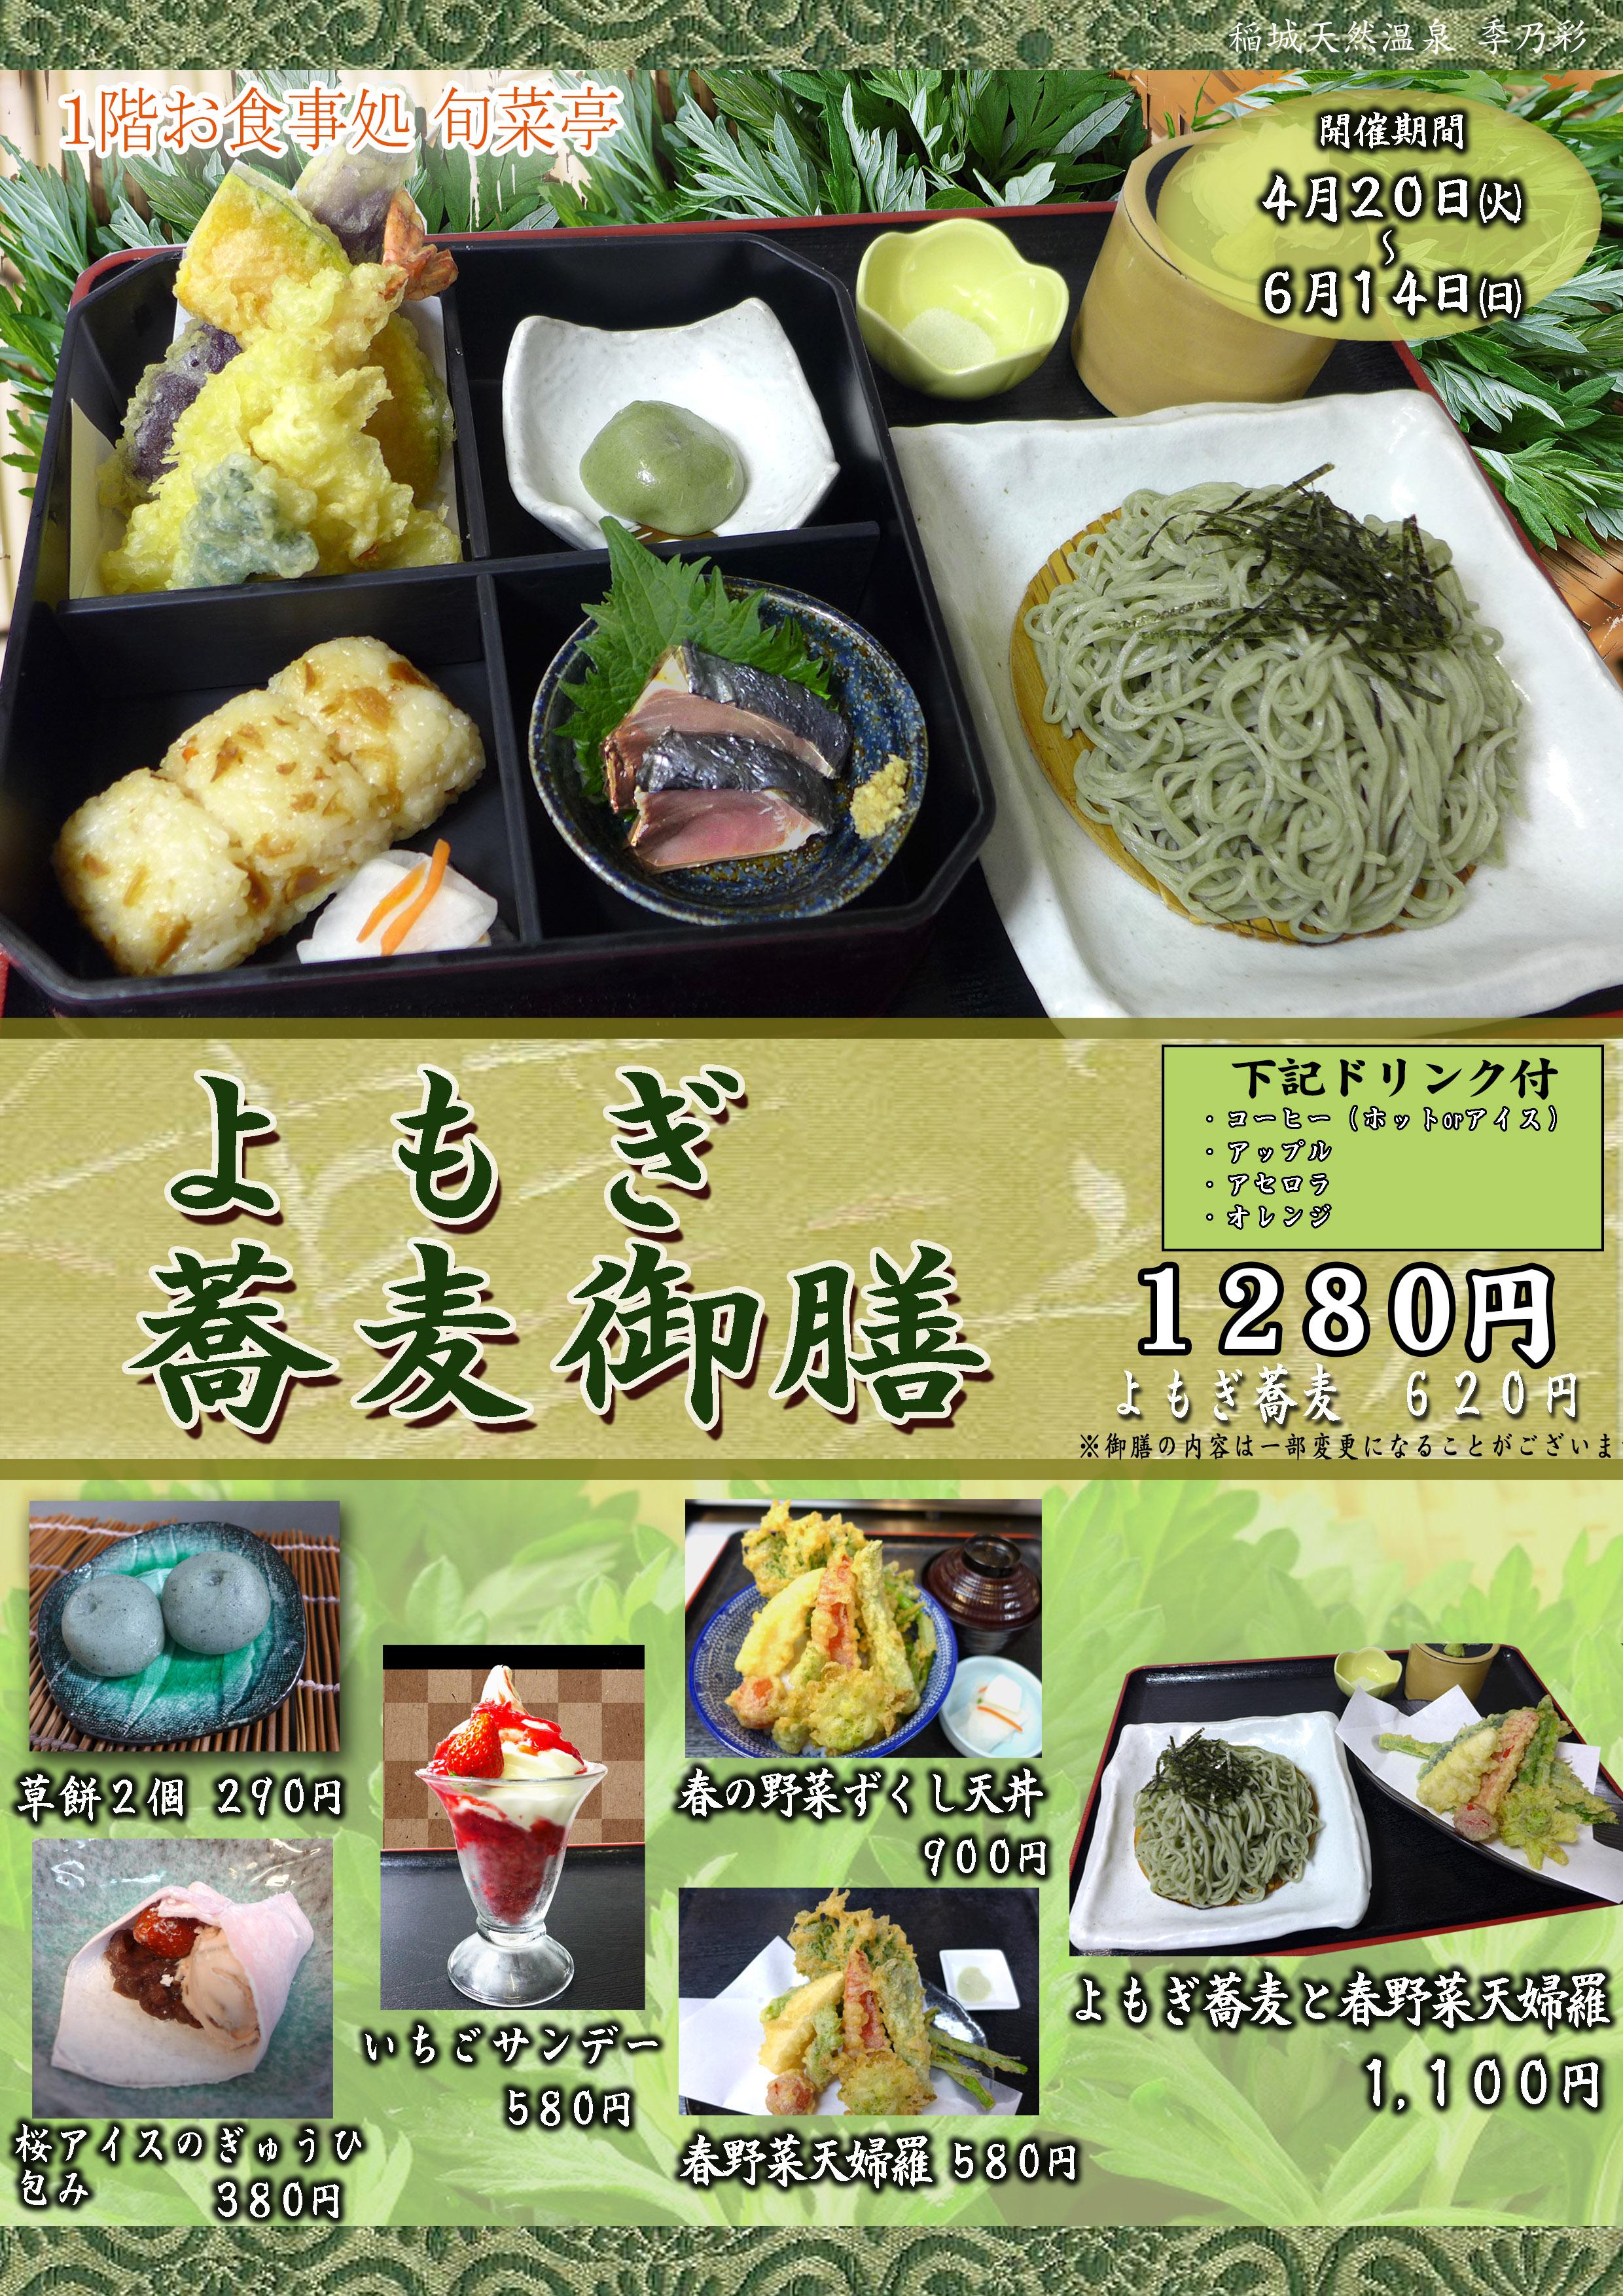 POP 旬菜亭フェア 5月 よもぎ 2021(草もち)